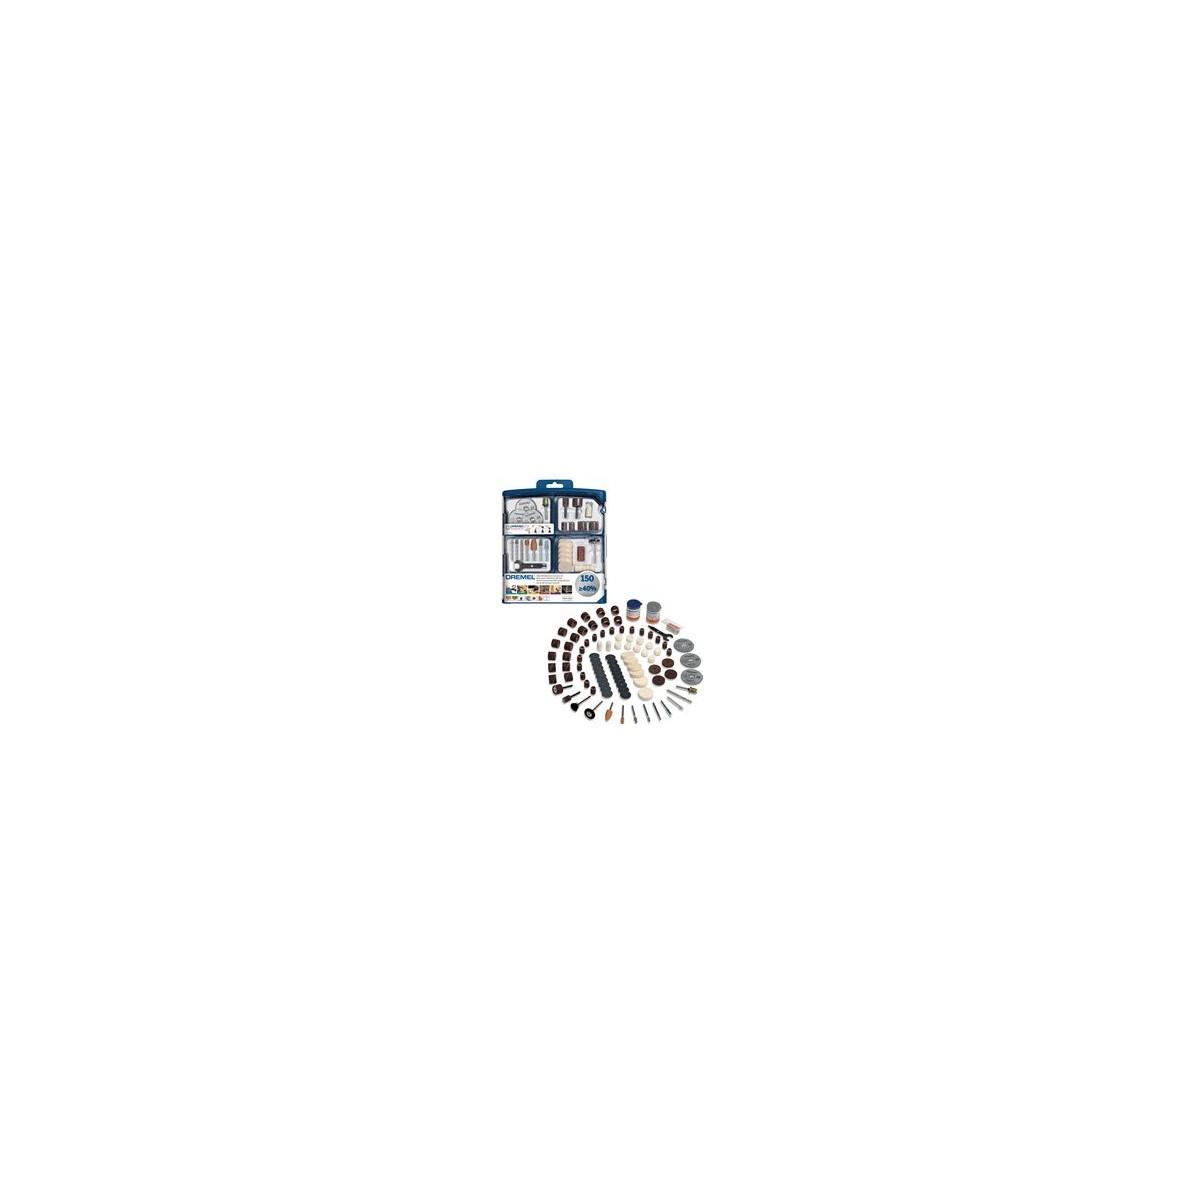 DREMEL 150 pieces Multipurpose Accessory Set 724 2615S724JA